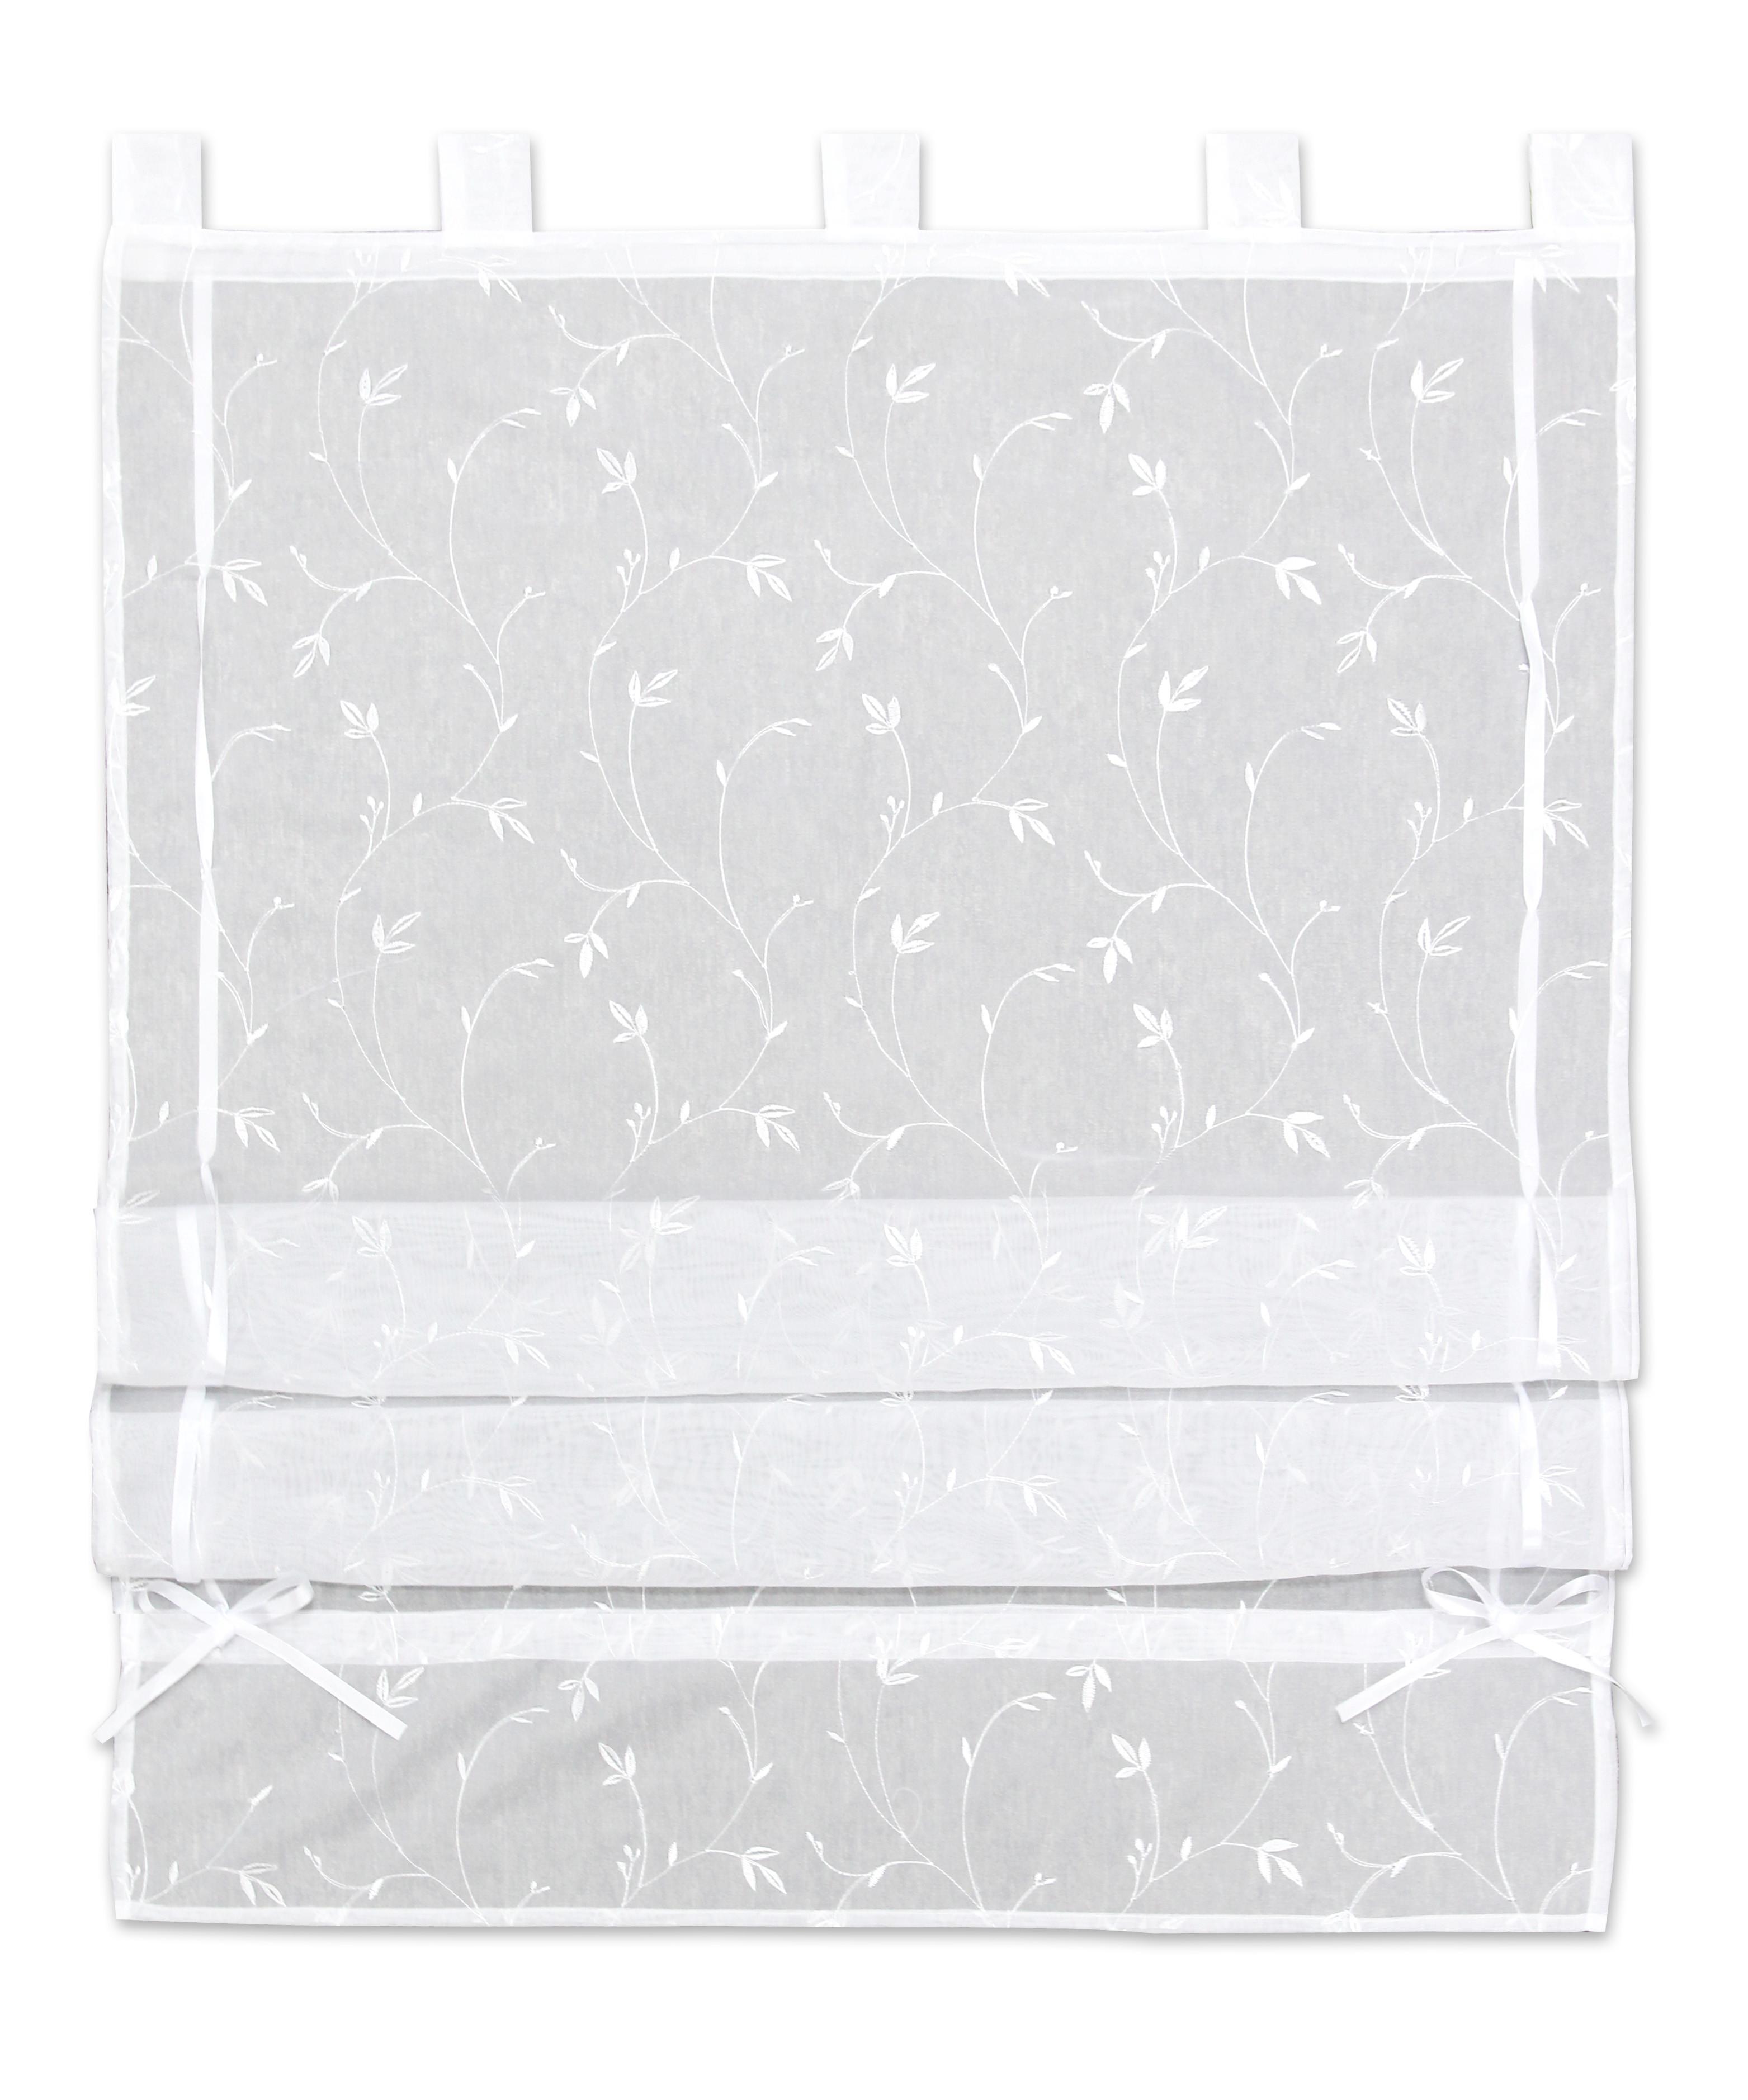 Szövetroló Romantic - fehér, romantikus/Landhaus, textil (100/140cm) - MÖMAX modern living